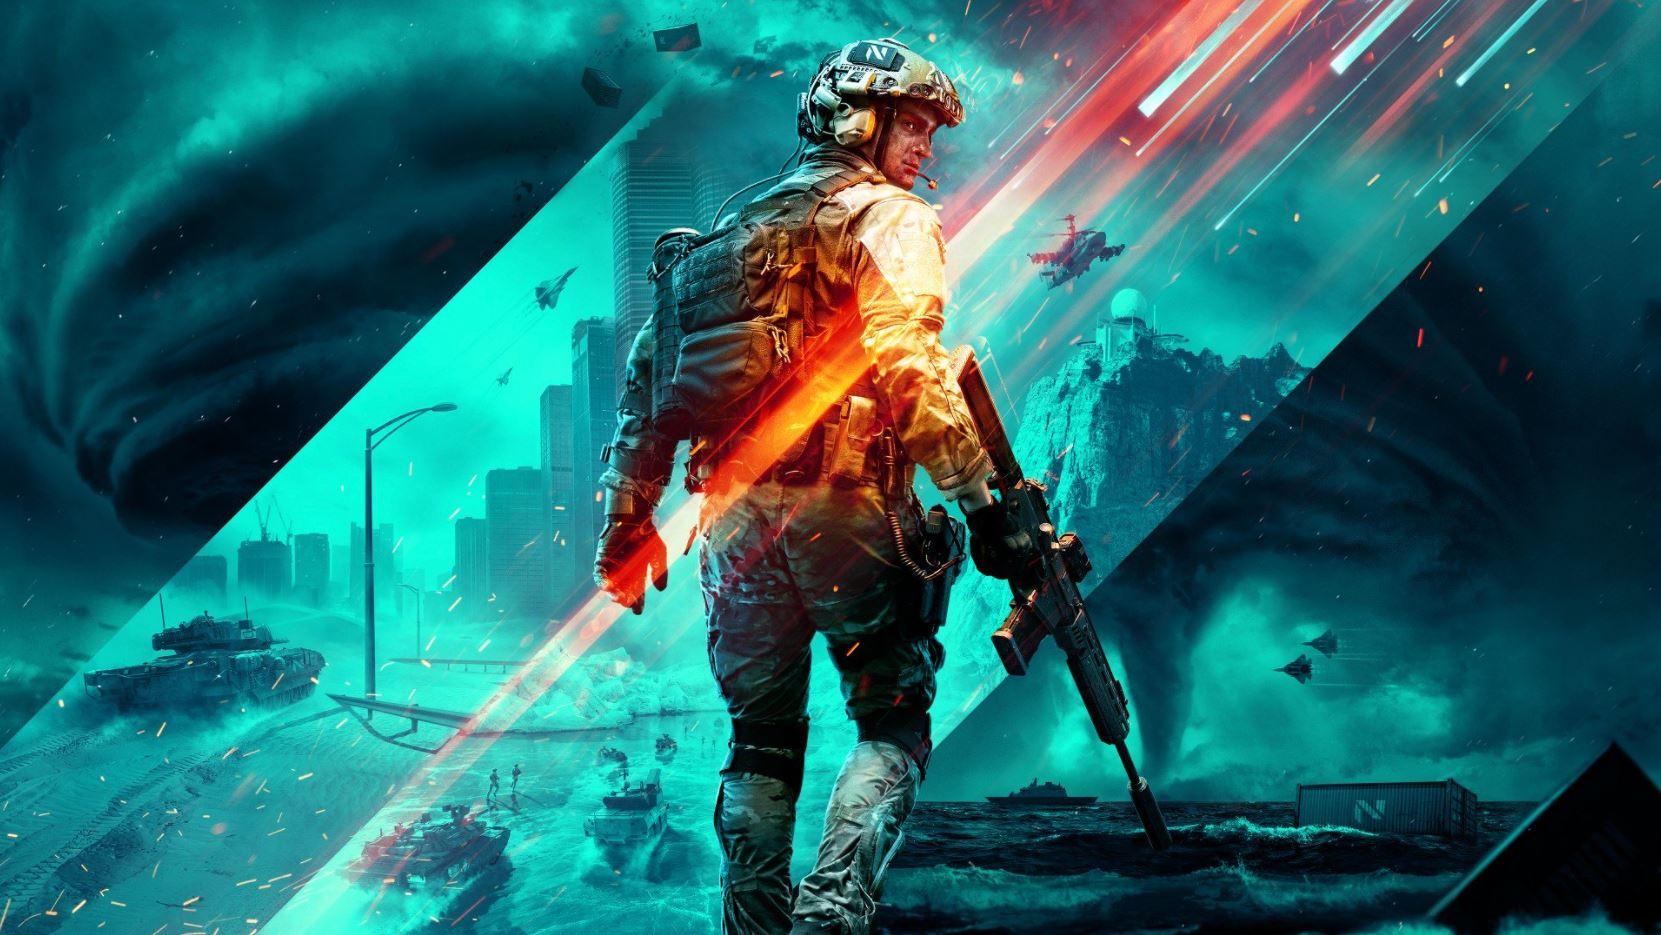 Battlefield 2042 Reveal Trailer - Date, Start Time, Where ...